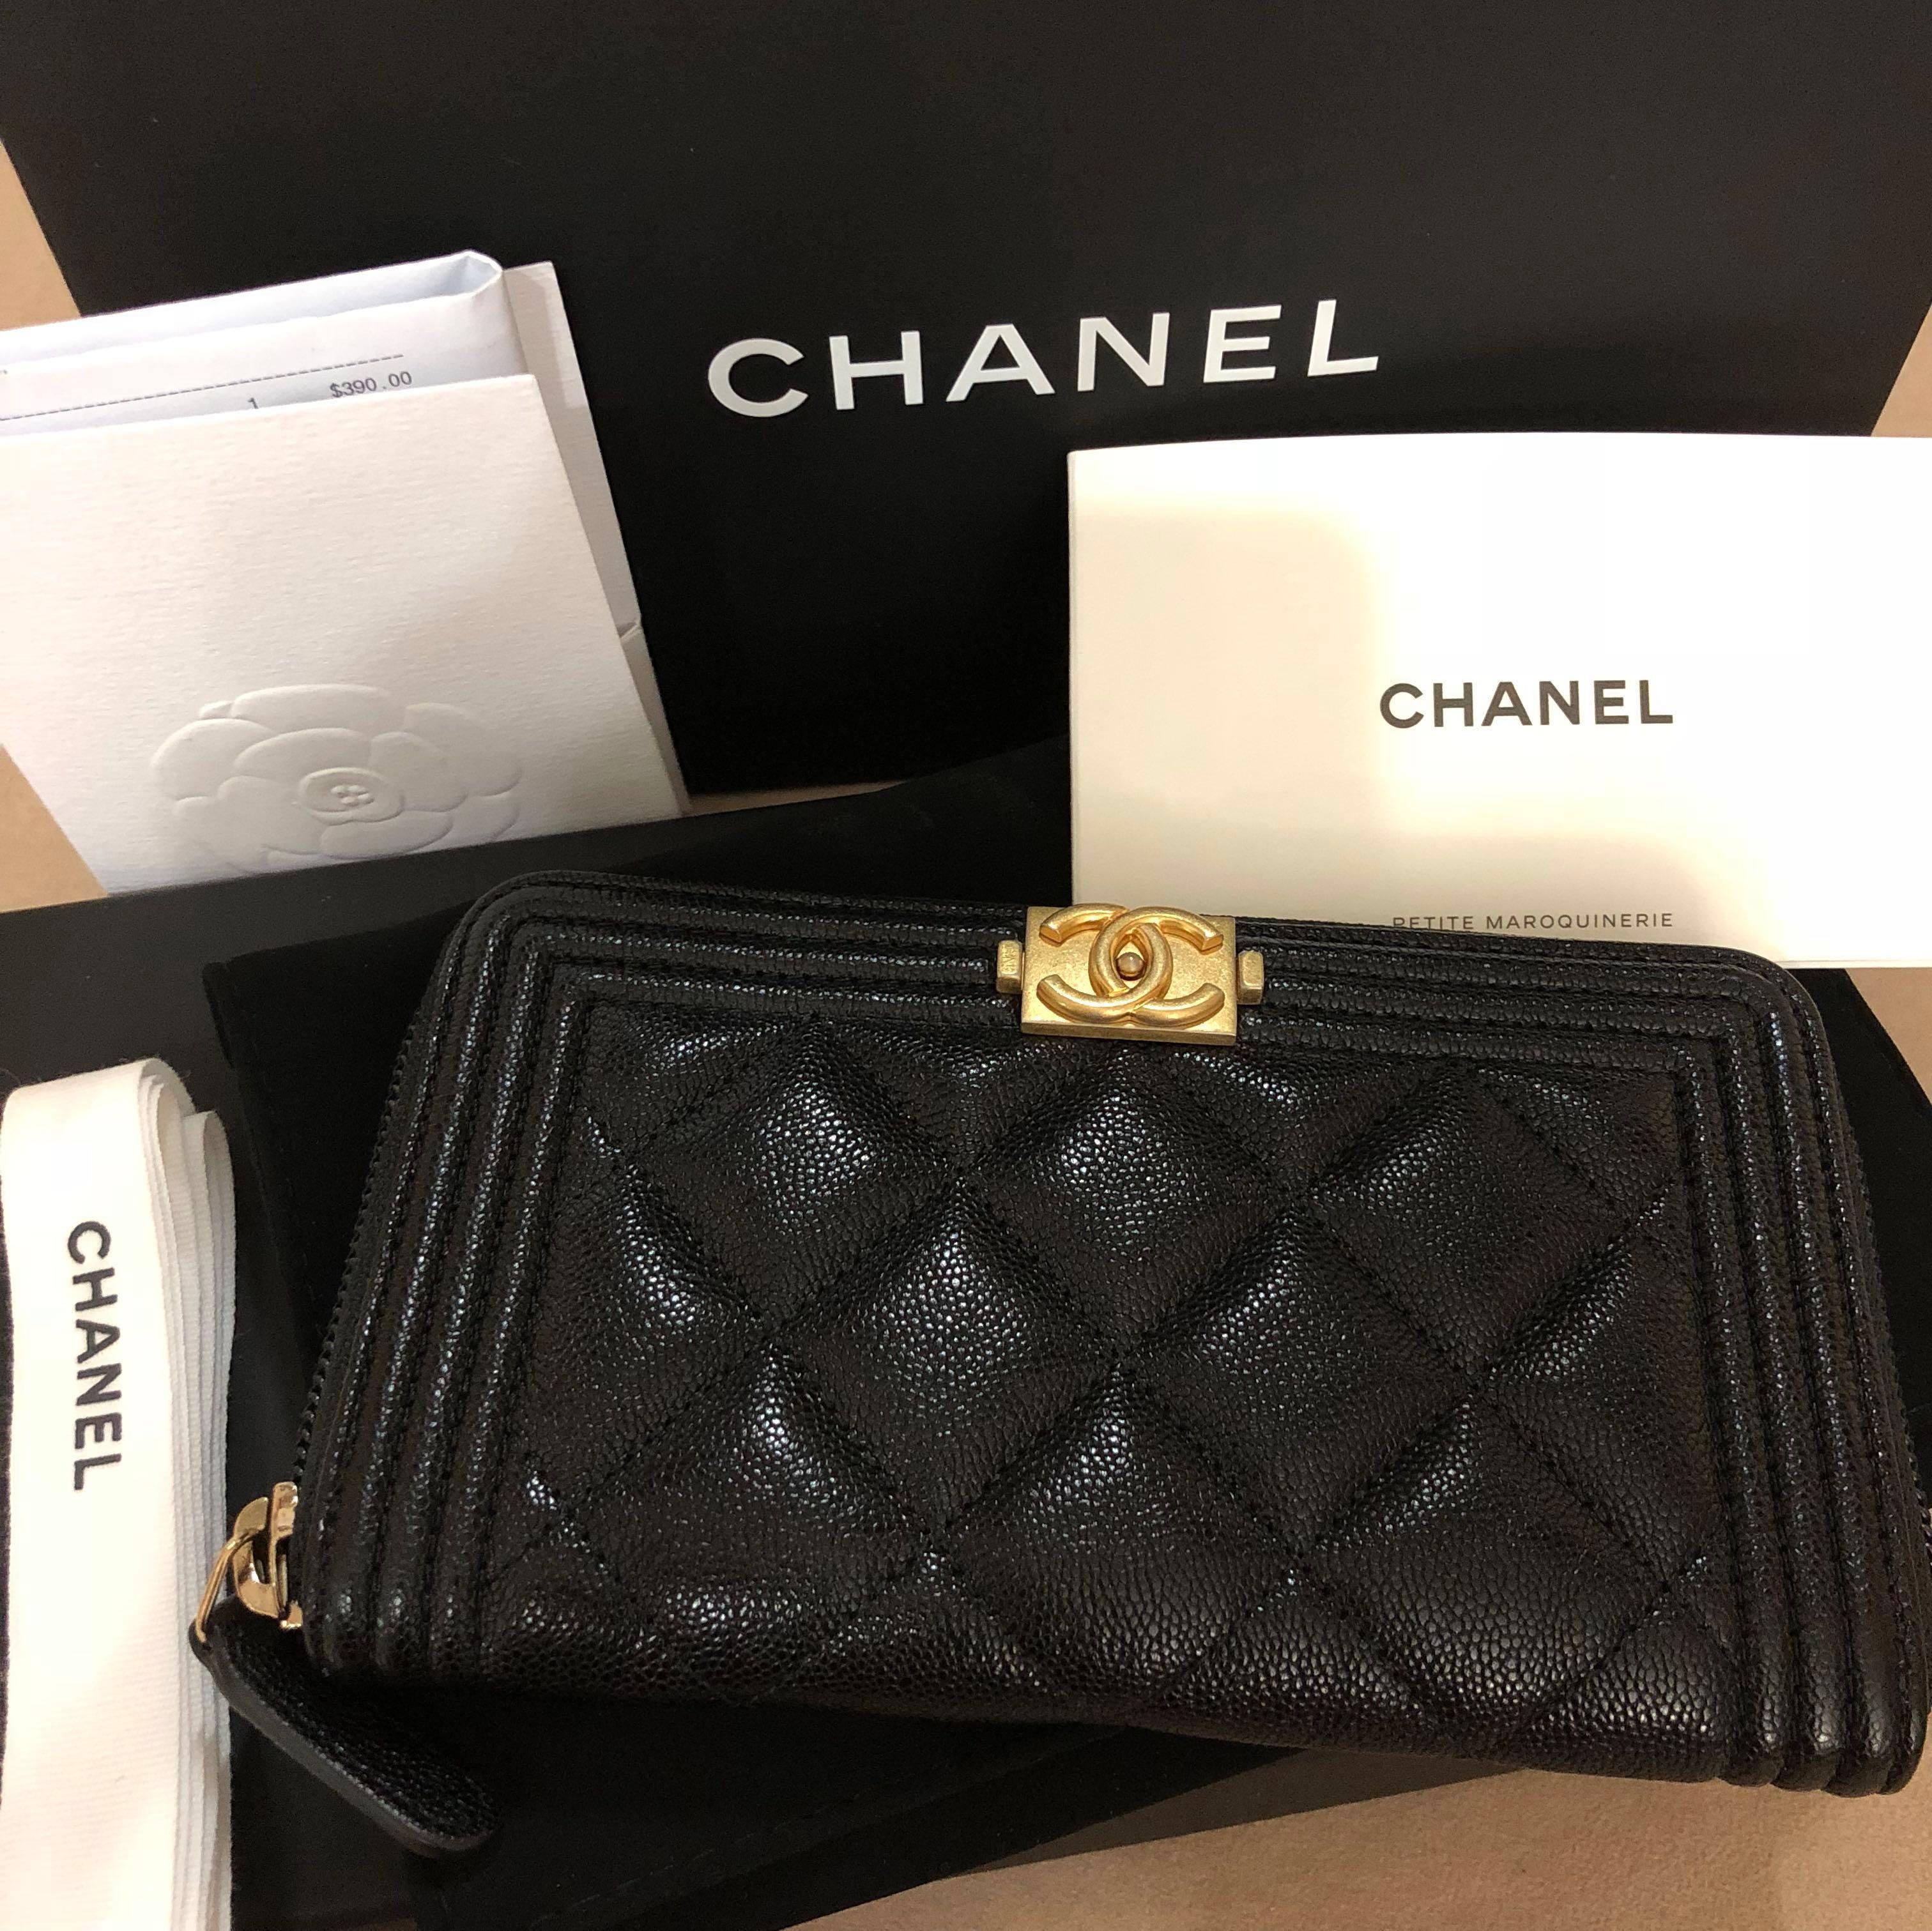 06d07bfff589 Chanel Boy Classic short zippy wallet, Luxury, Bags & Wallets, Wallets on  Carousell